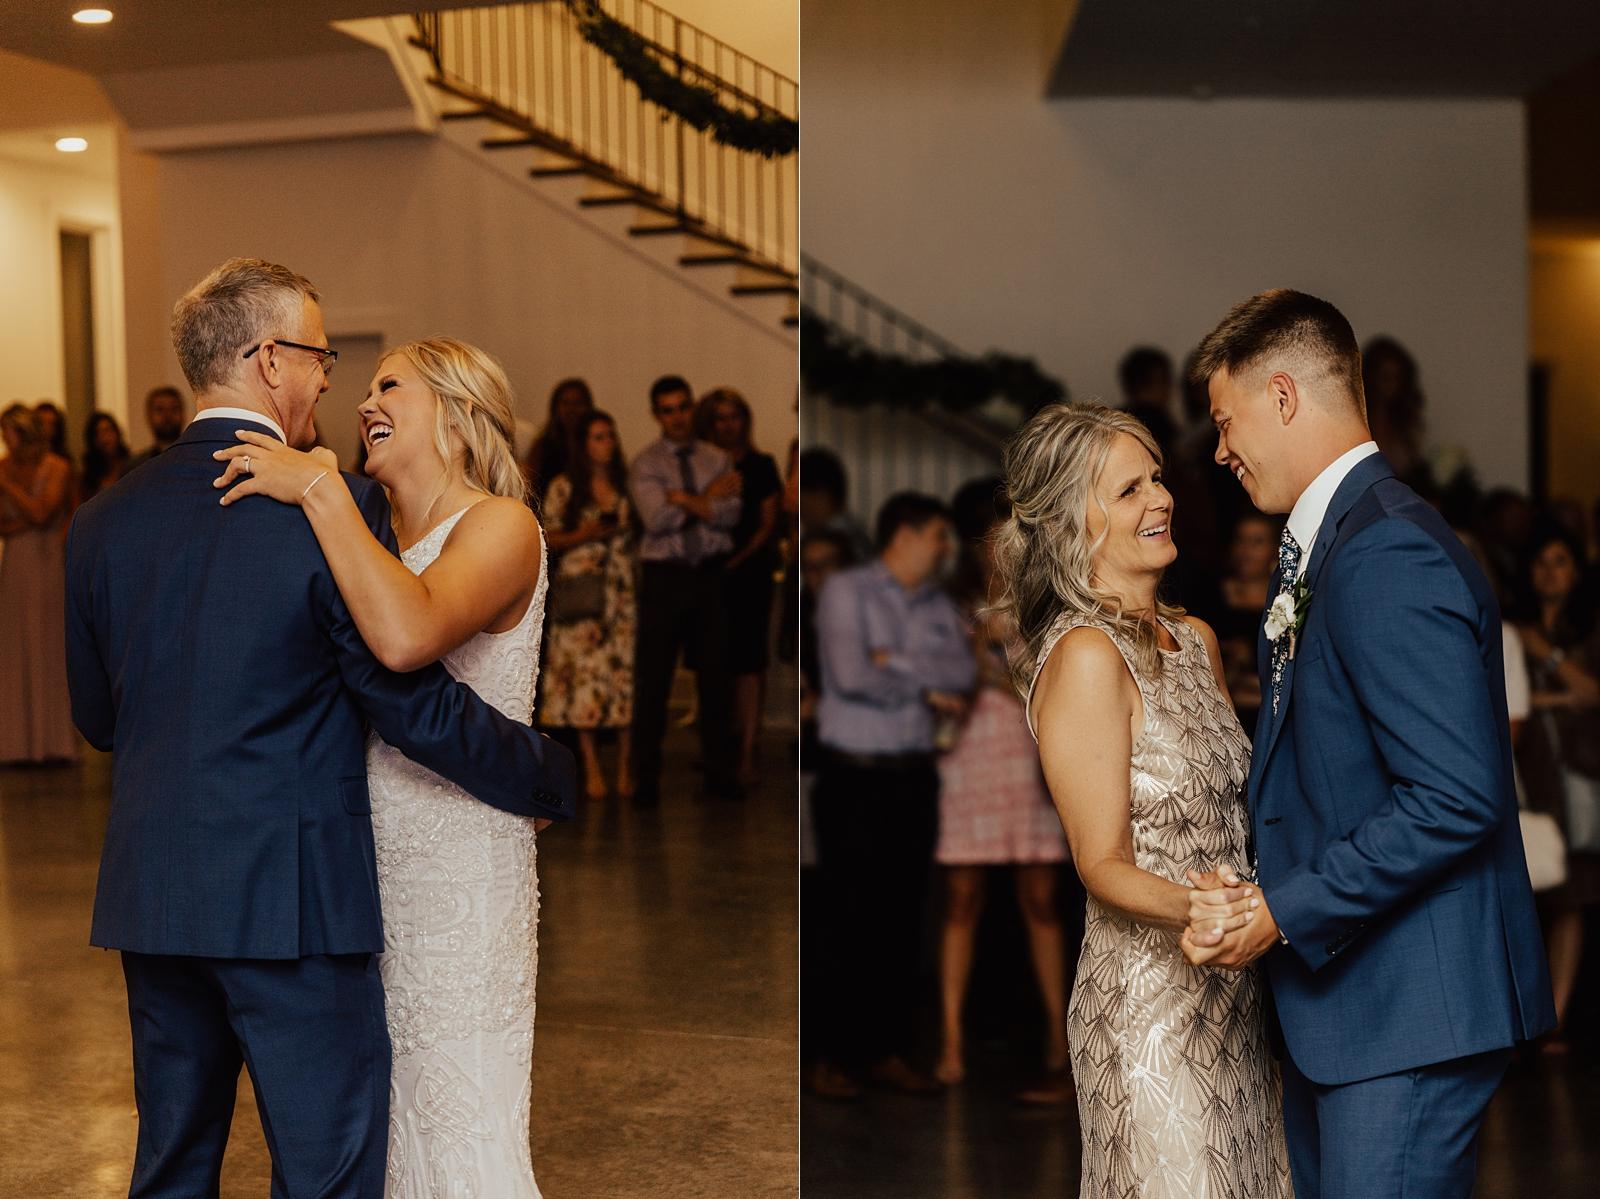 Anna & Trey Modern Minneapolis Wedding at The Hutton House_0741.jpg